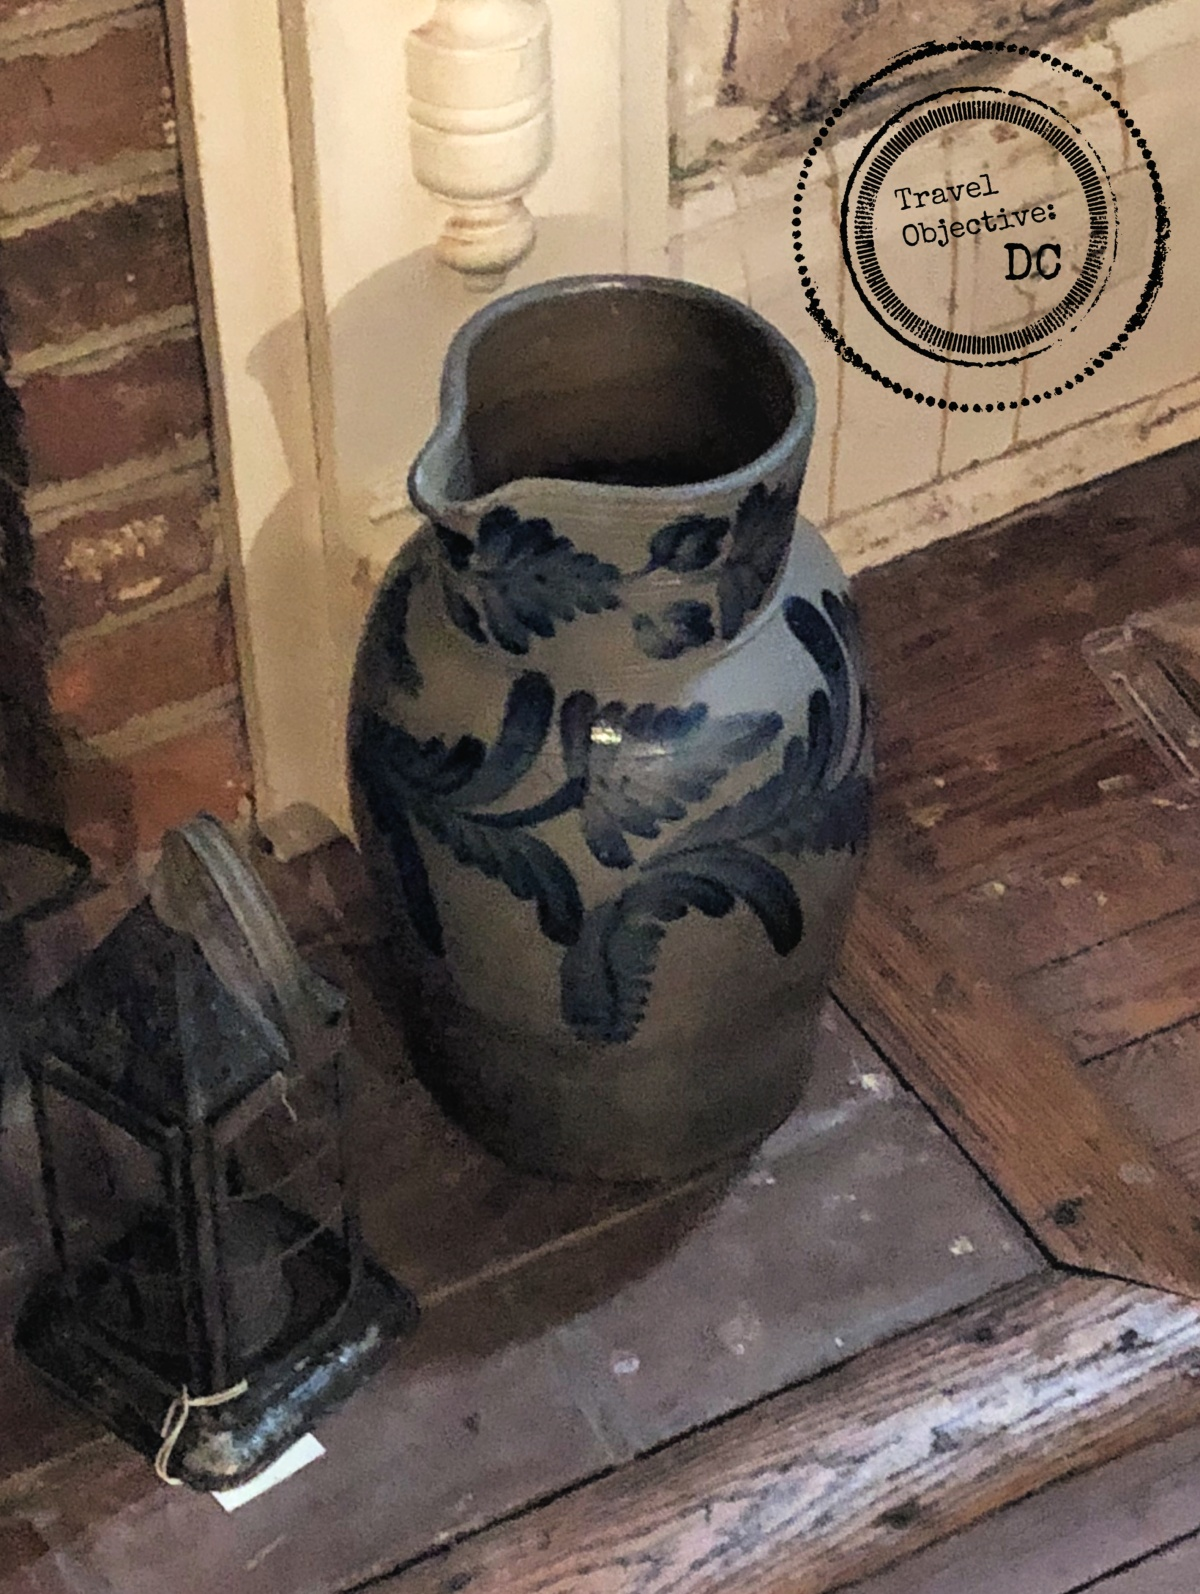 Vase on display from Historic Blenheim Civil War site in Fairfax Virginia